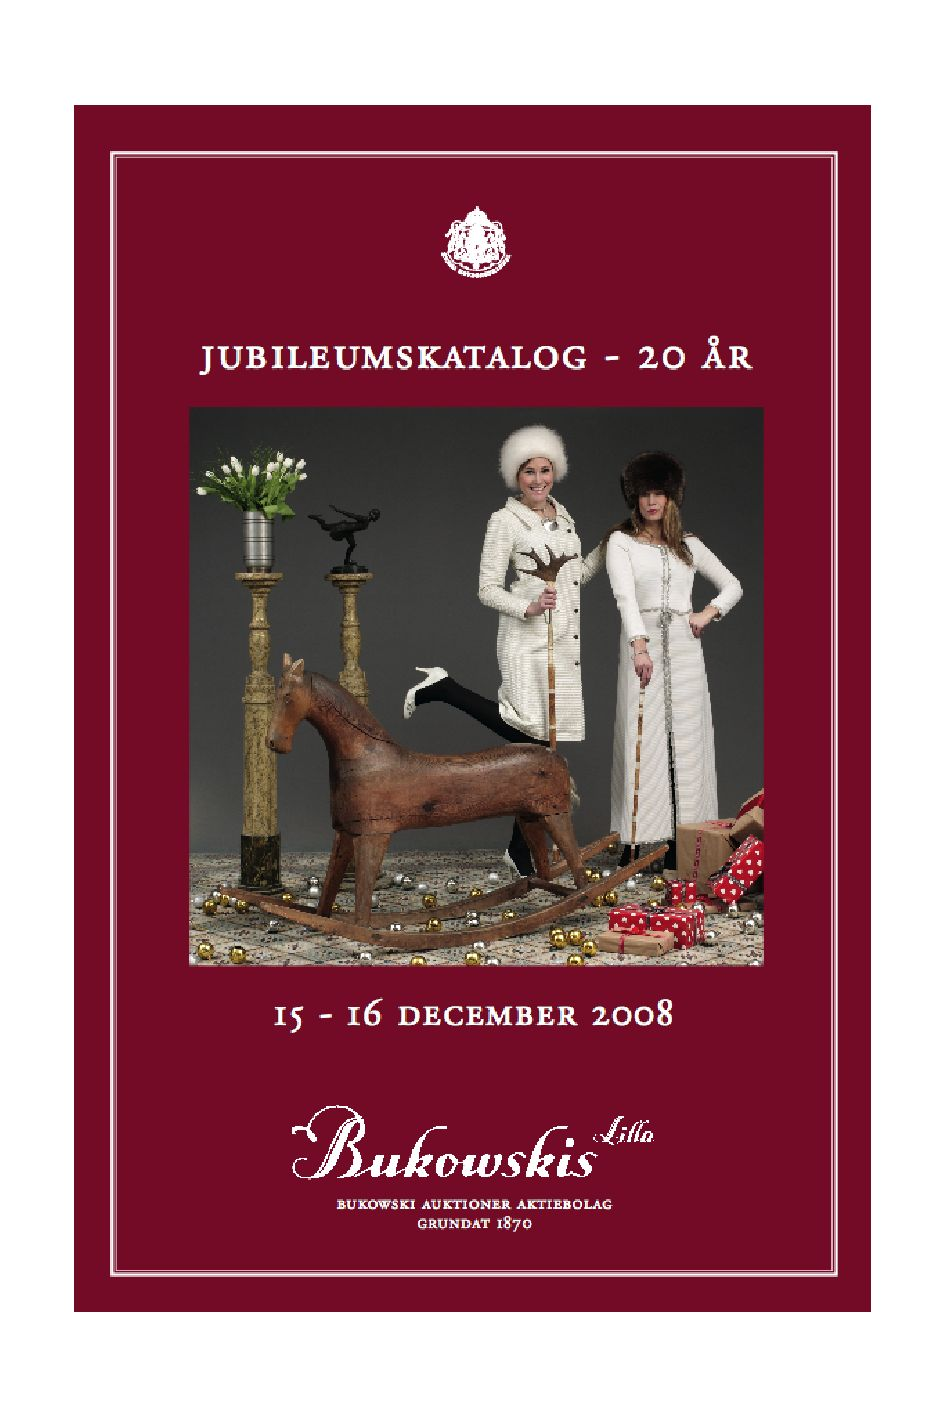 2ea9ed72a17d Lilla Bukowskis Jubileumskatalog S186 by Bukowskis - issuu